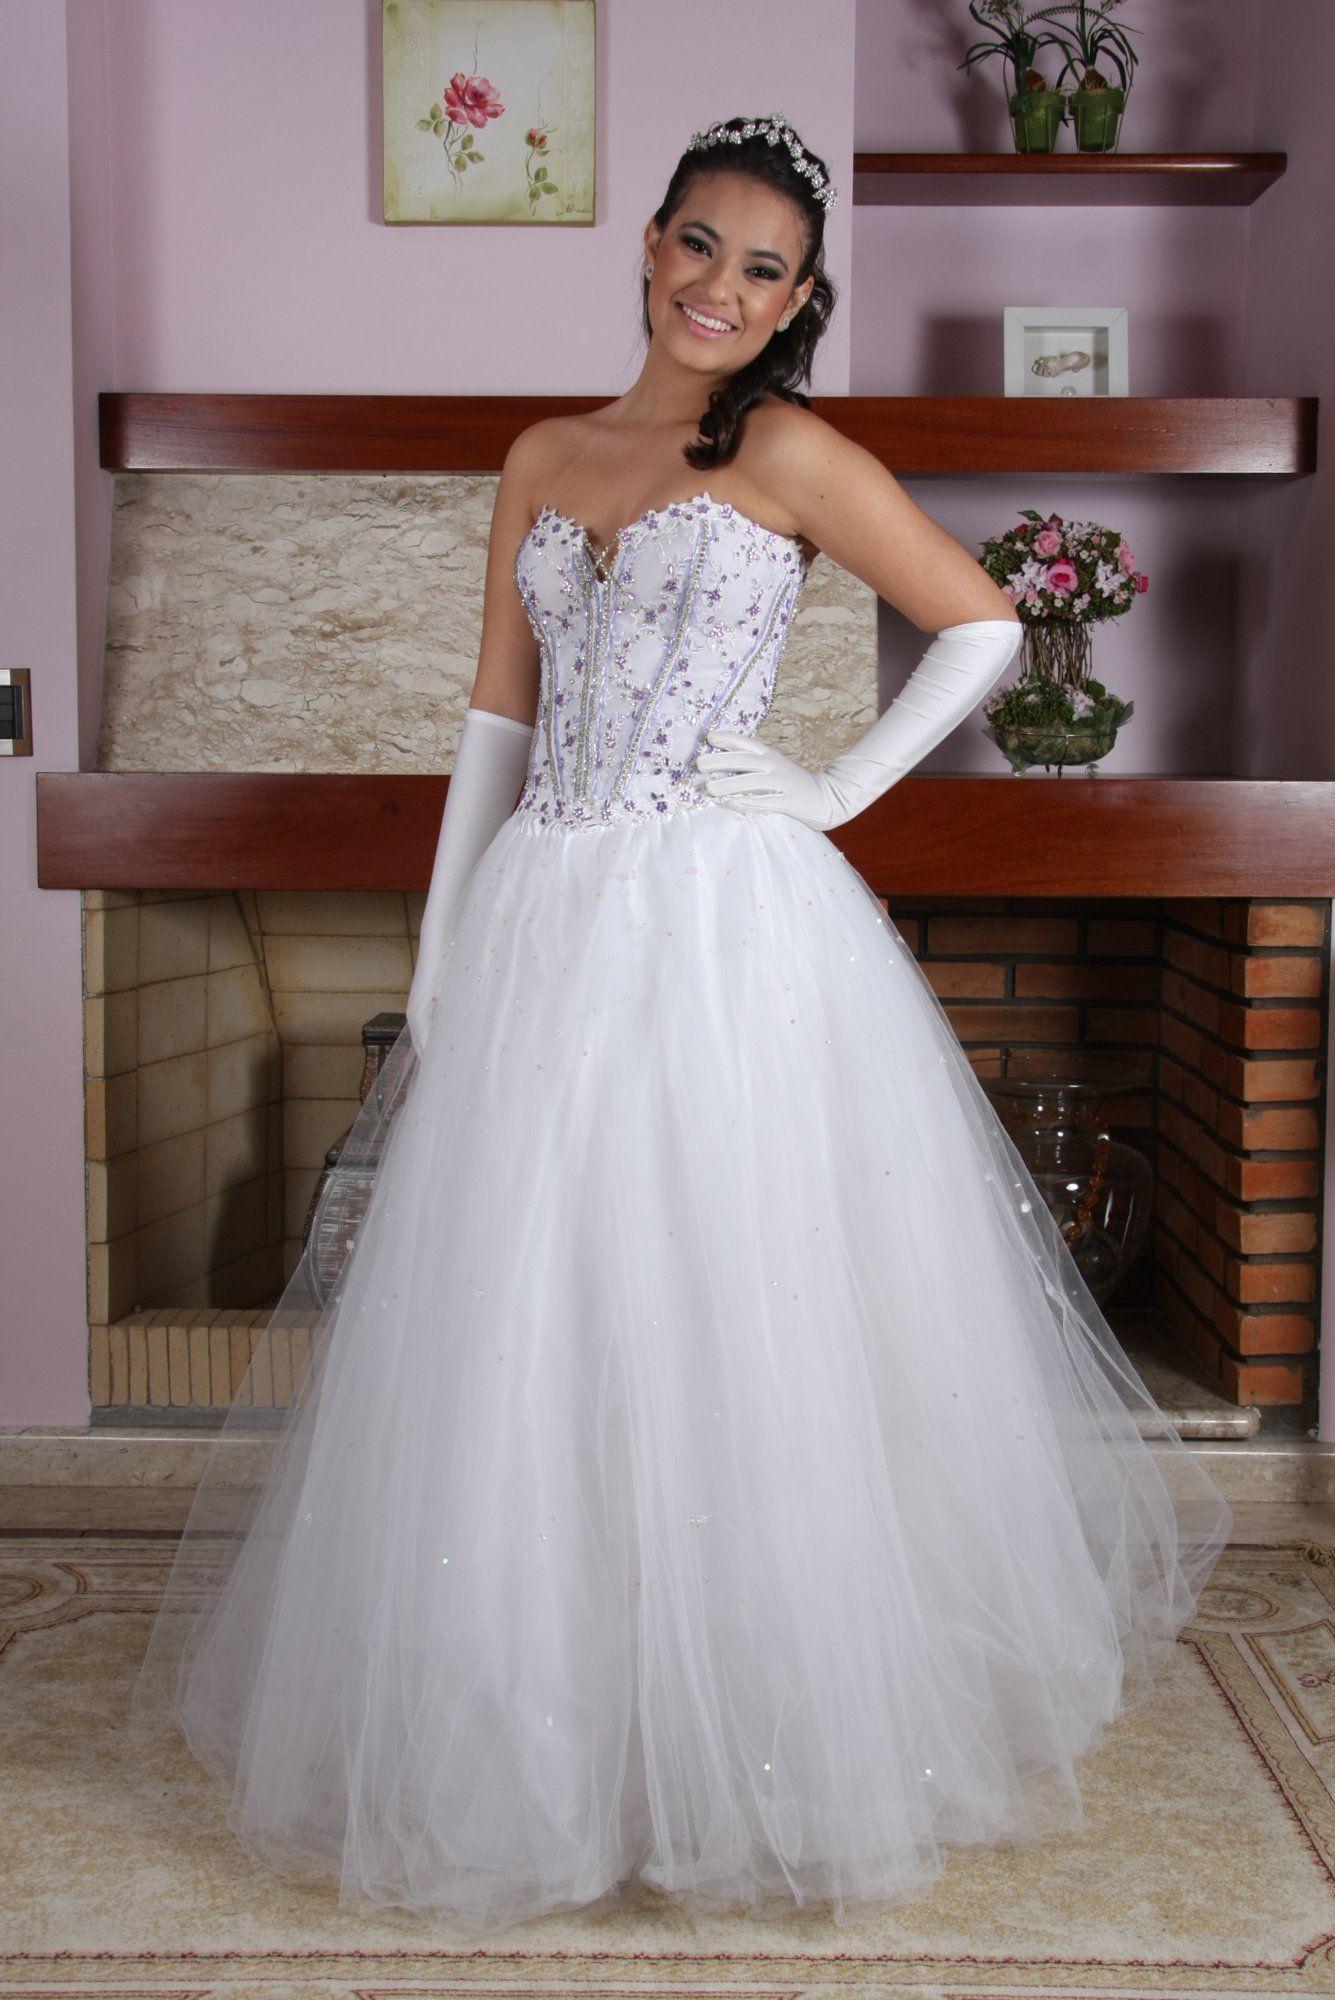 Vestido de Debutante Lilas - 12 - Hipnose Alta Costura e Spa para Noivas e Noivos - Campinas - SP Vestido de Debutante, Vestido de Debutante Lilas, Hipnose Alta Costura